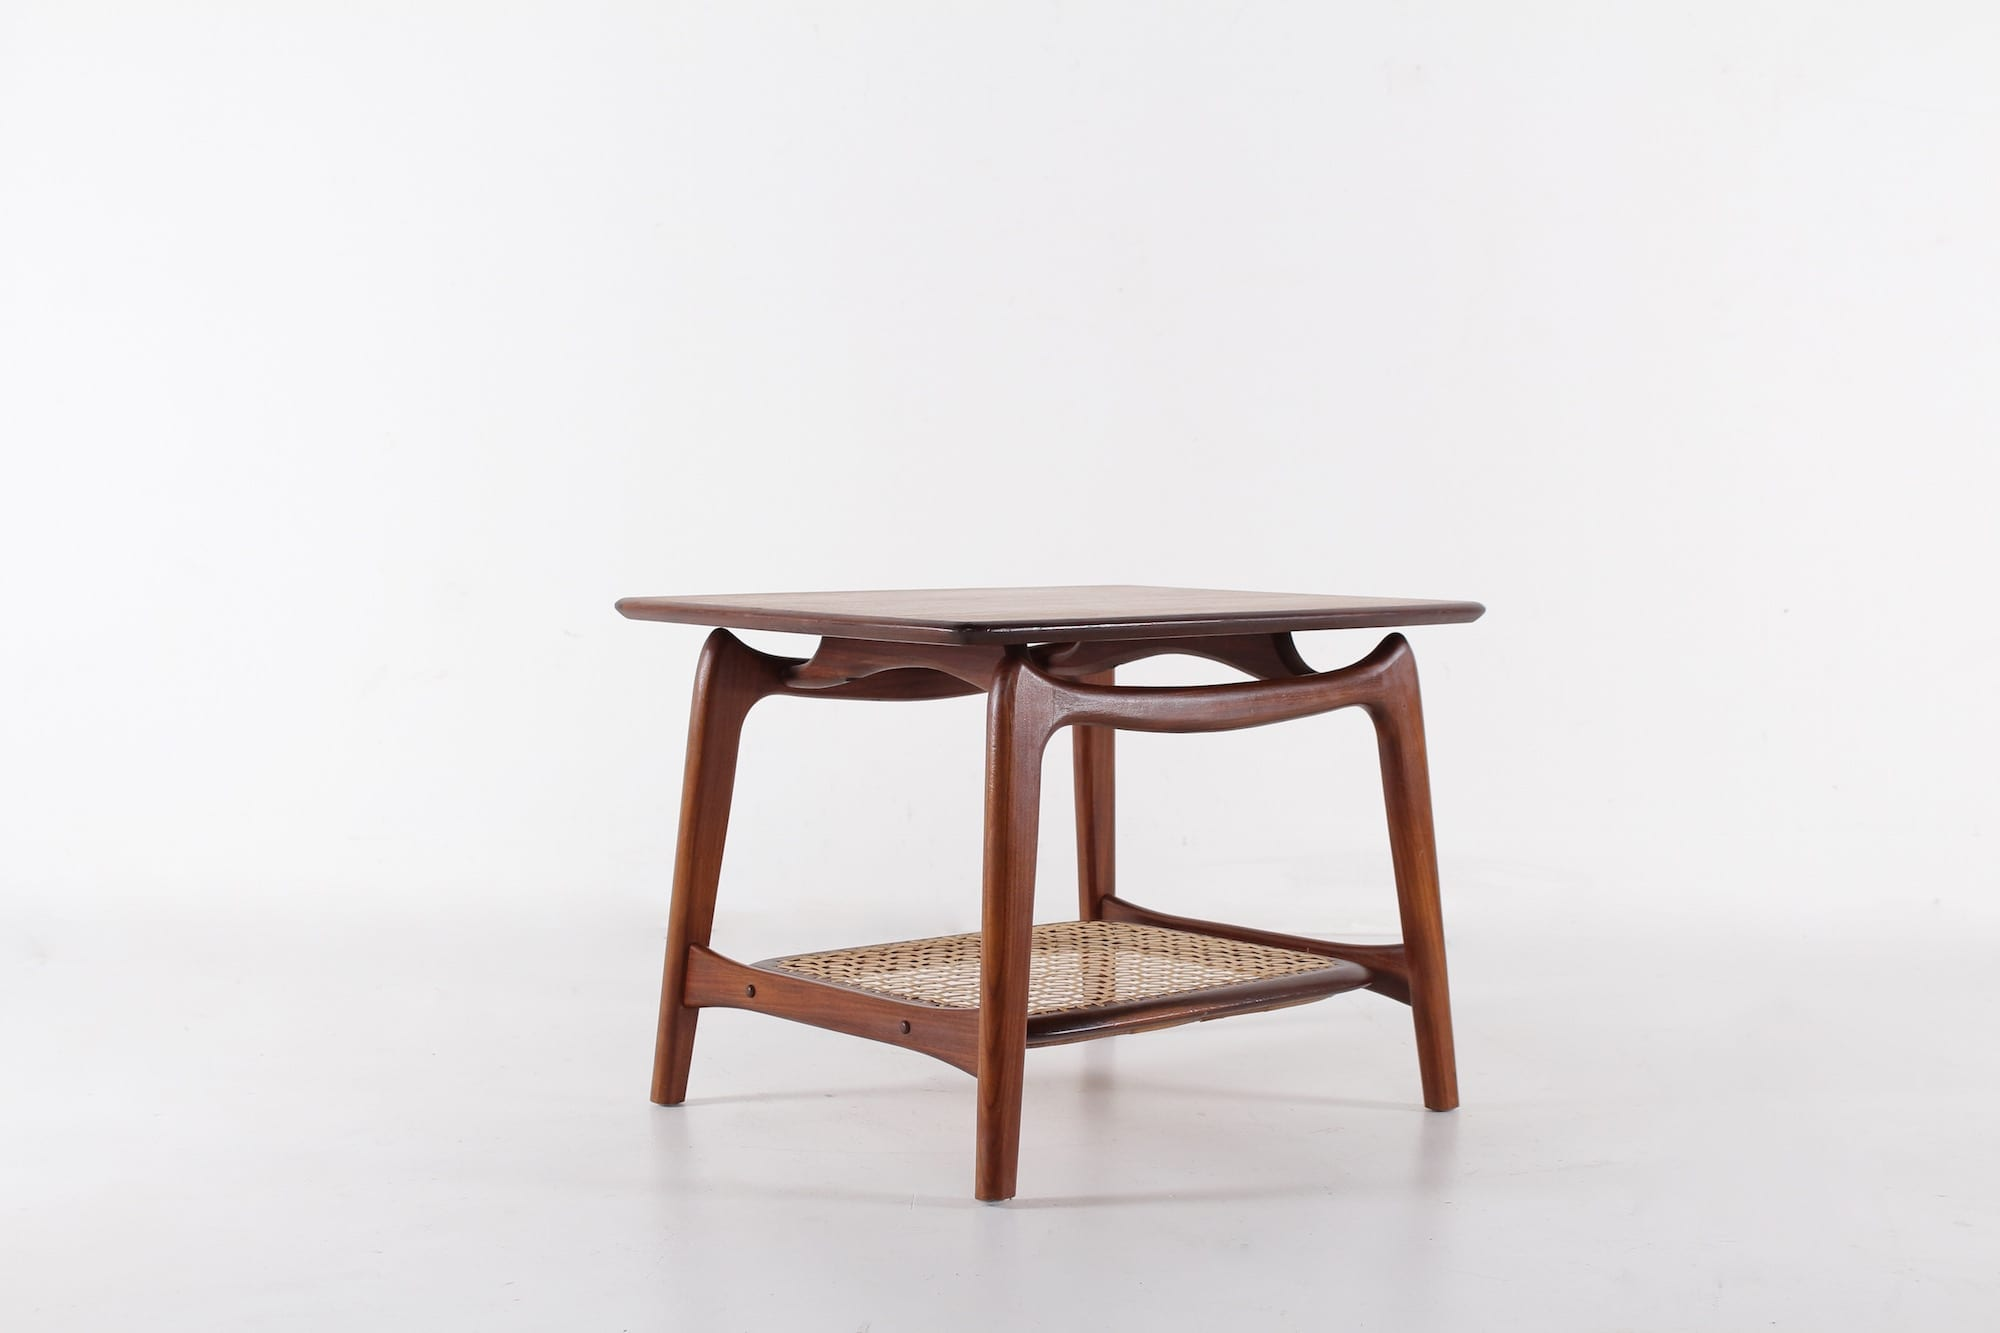 petite table basse louis van teeffelen meubles vintage li ge. Black Bedroom Furniture Sets. Home Design Ideas